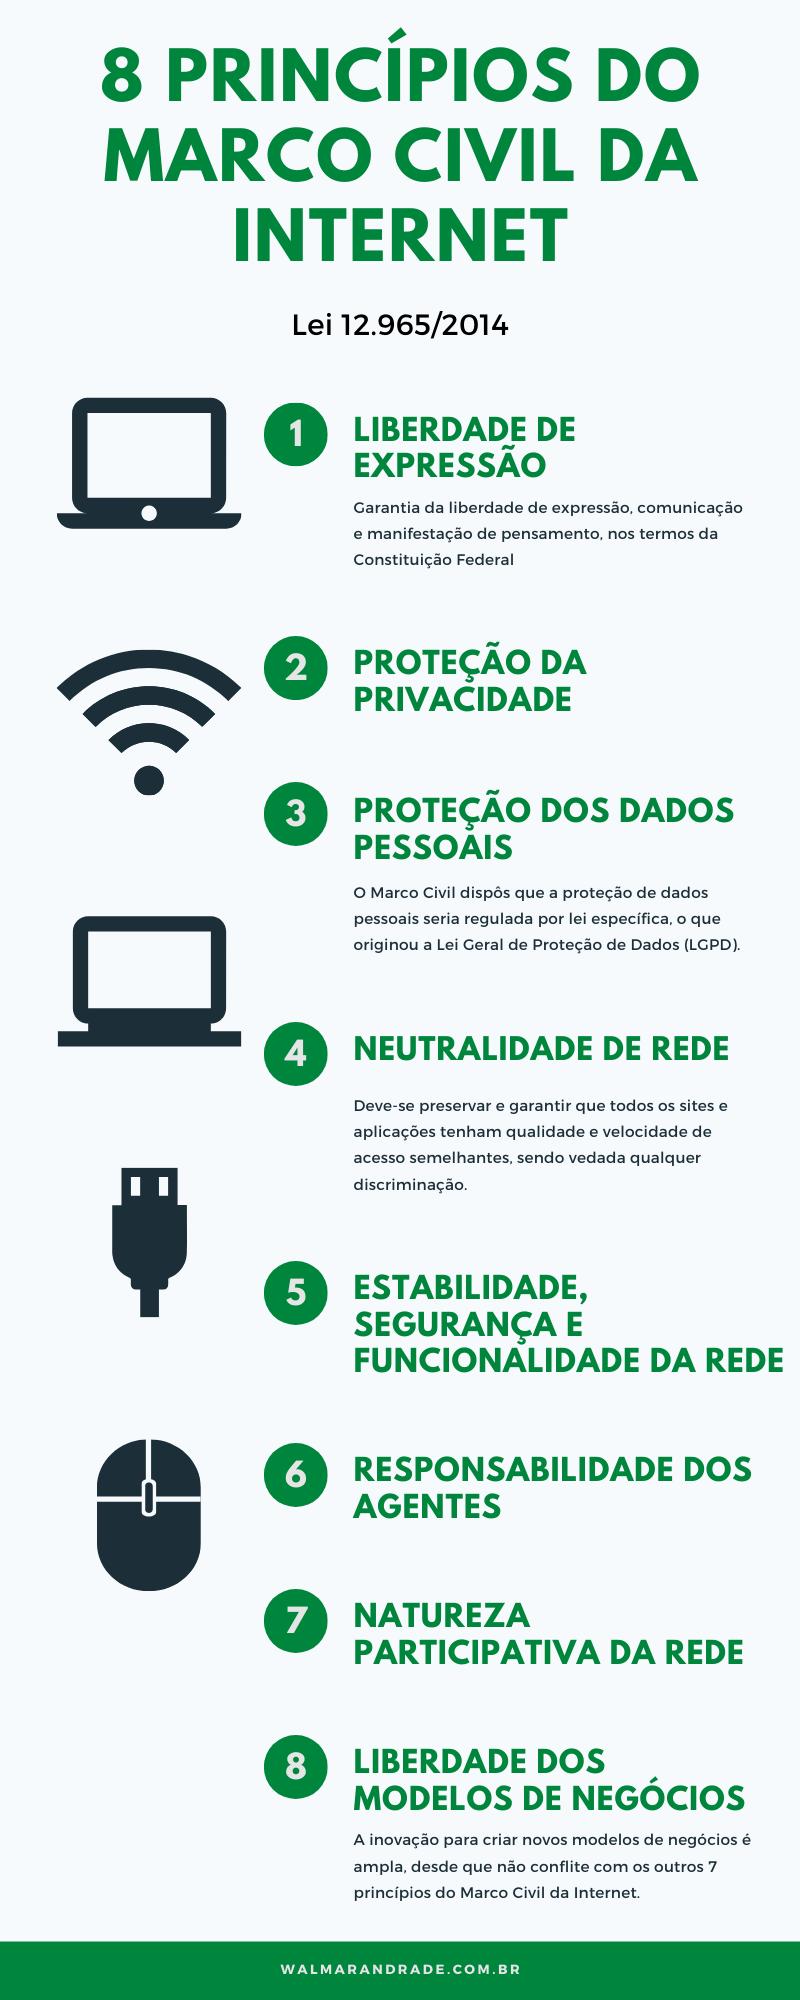 Princípios do Marco Civil da Internet